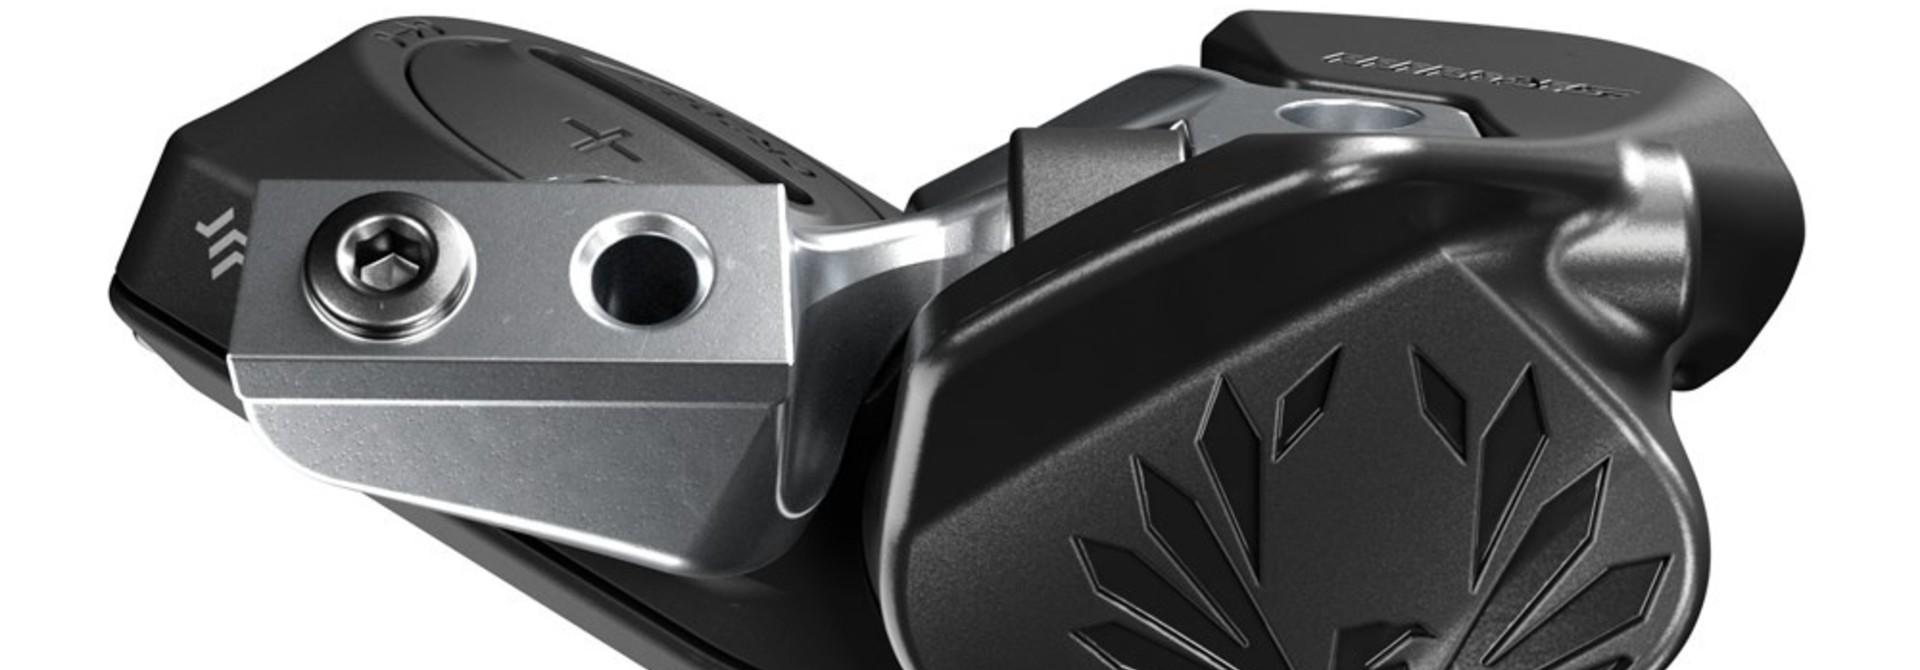 SRM XX1/X01 Eagle AXS Controller